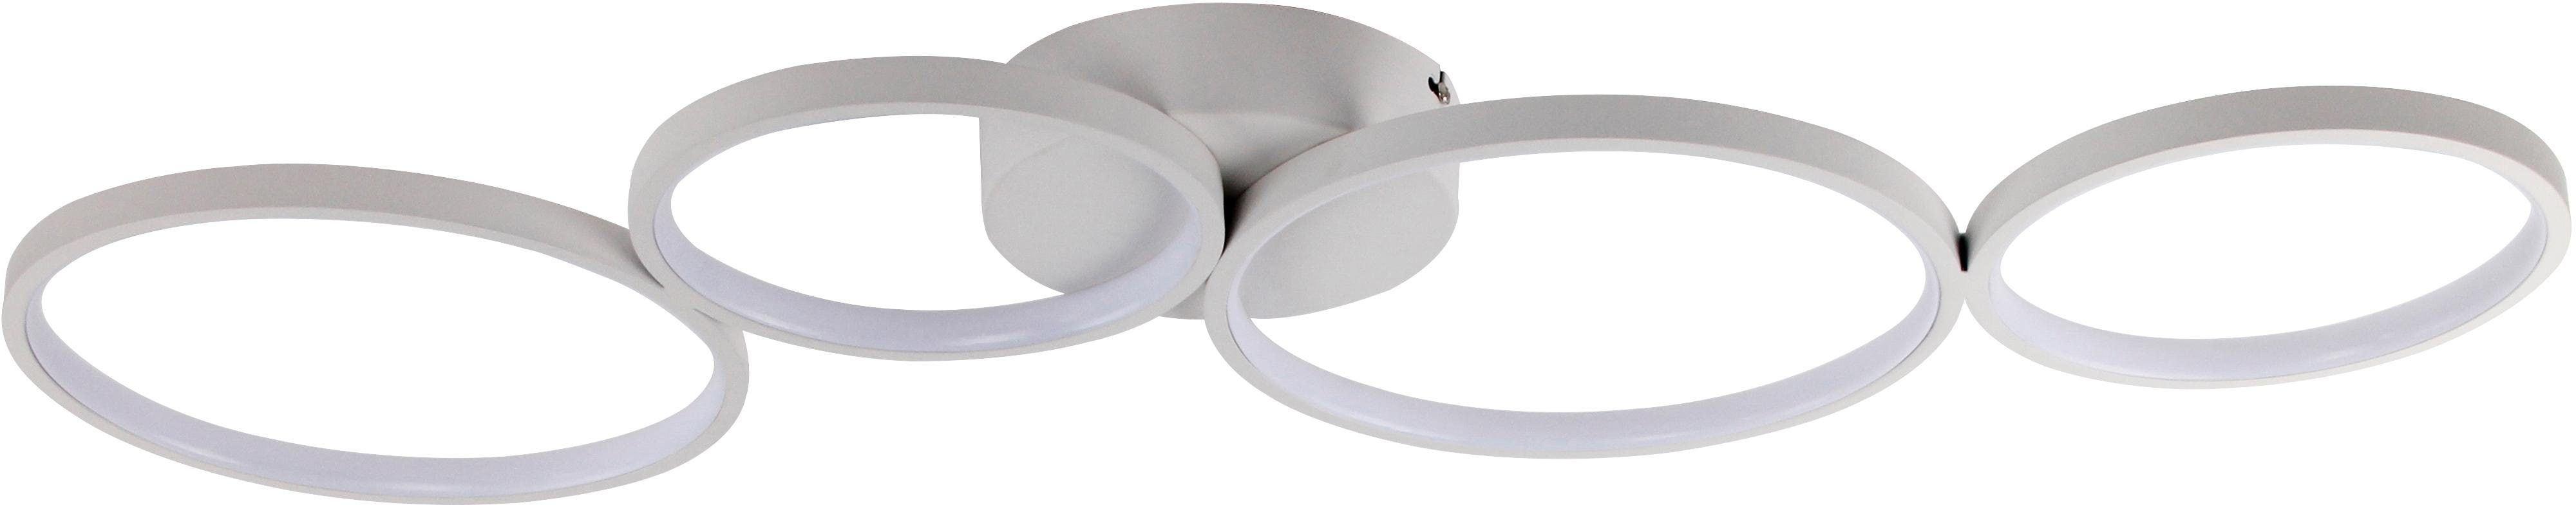 WOFI Deckenleuchte VIKA, LED-Board, Warmweiß, Deckenlampe